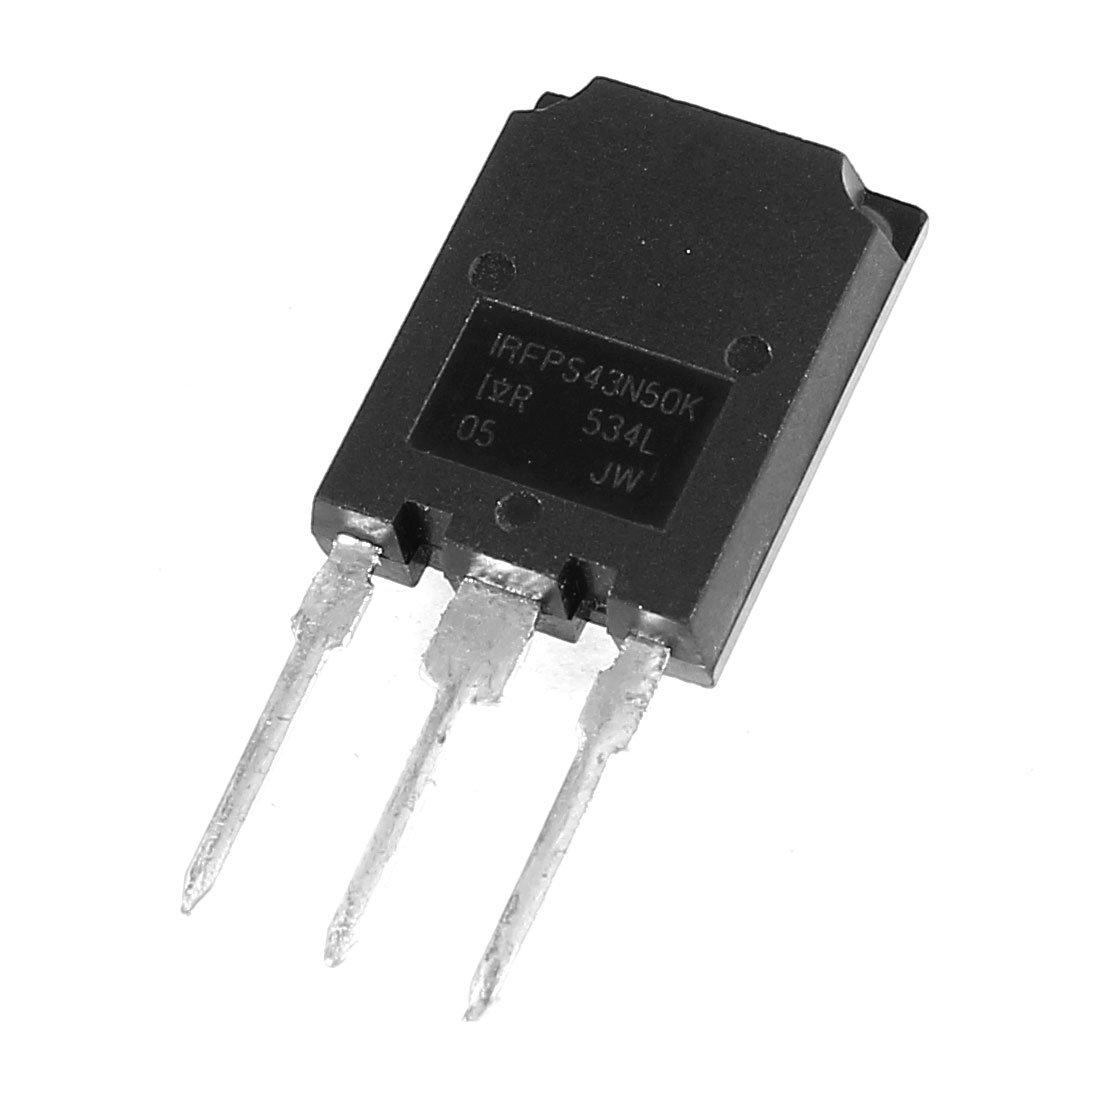 Aexit 500V 47Amp High Voltage Current NPN Power Transistor IRFPS43N50K